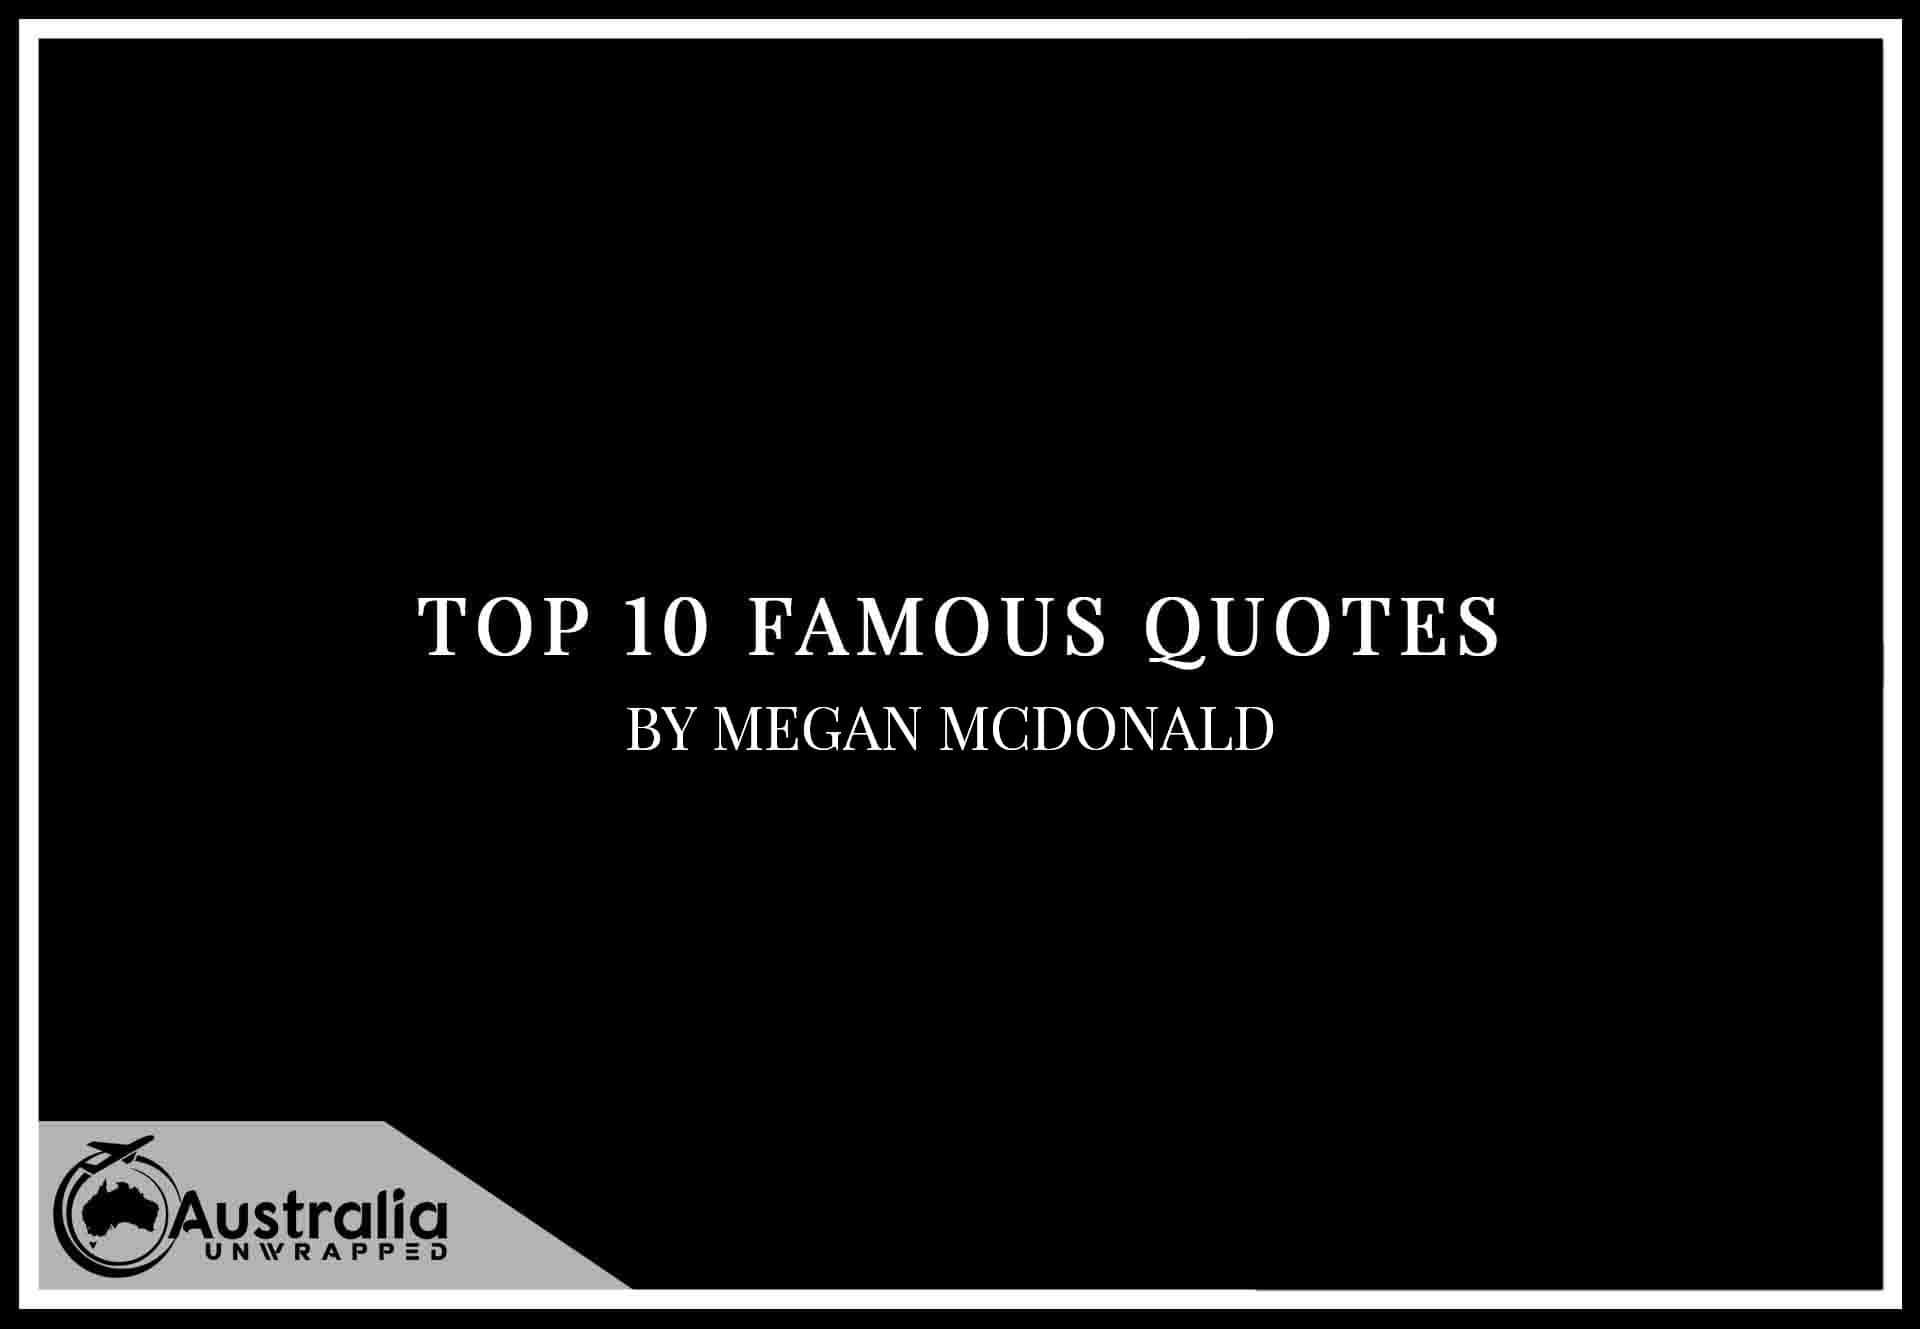 Top 10 Famous Quotes by Author Megan McDonald